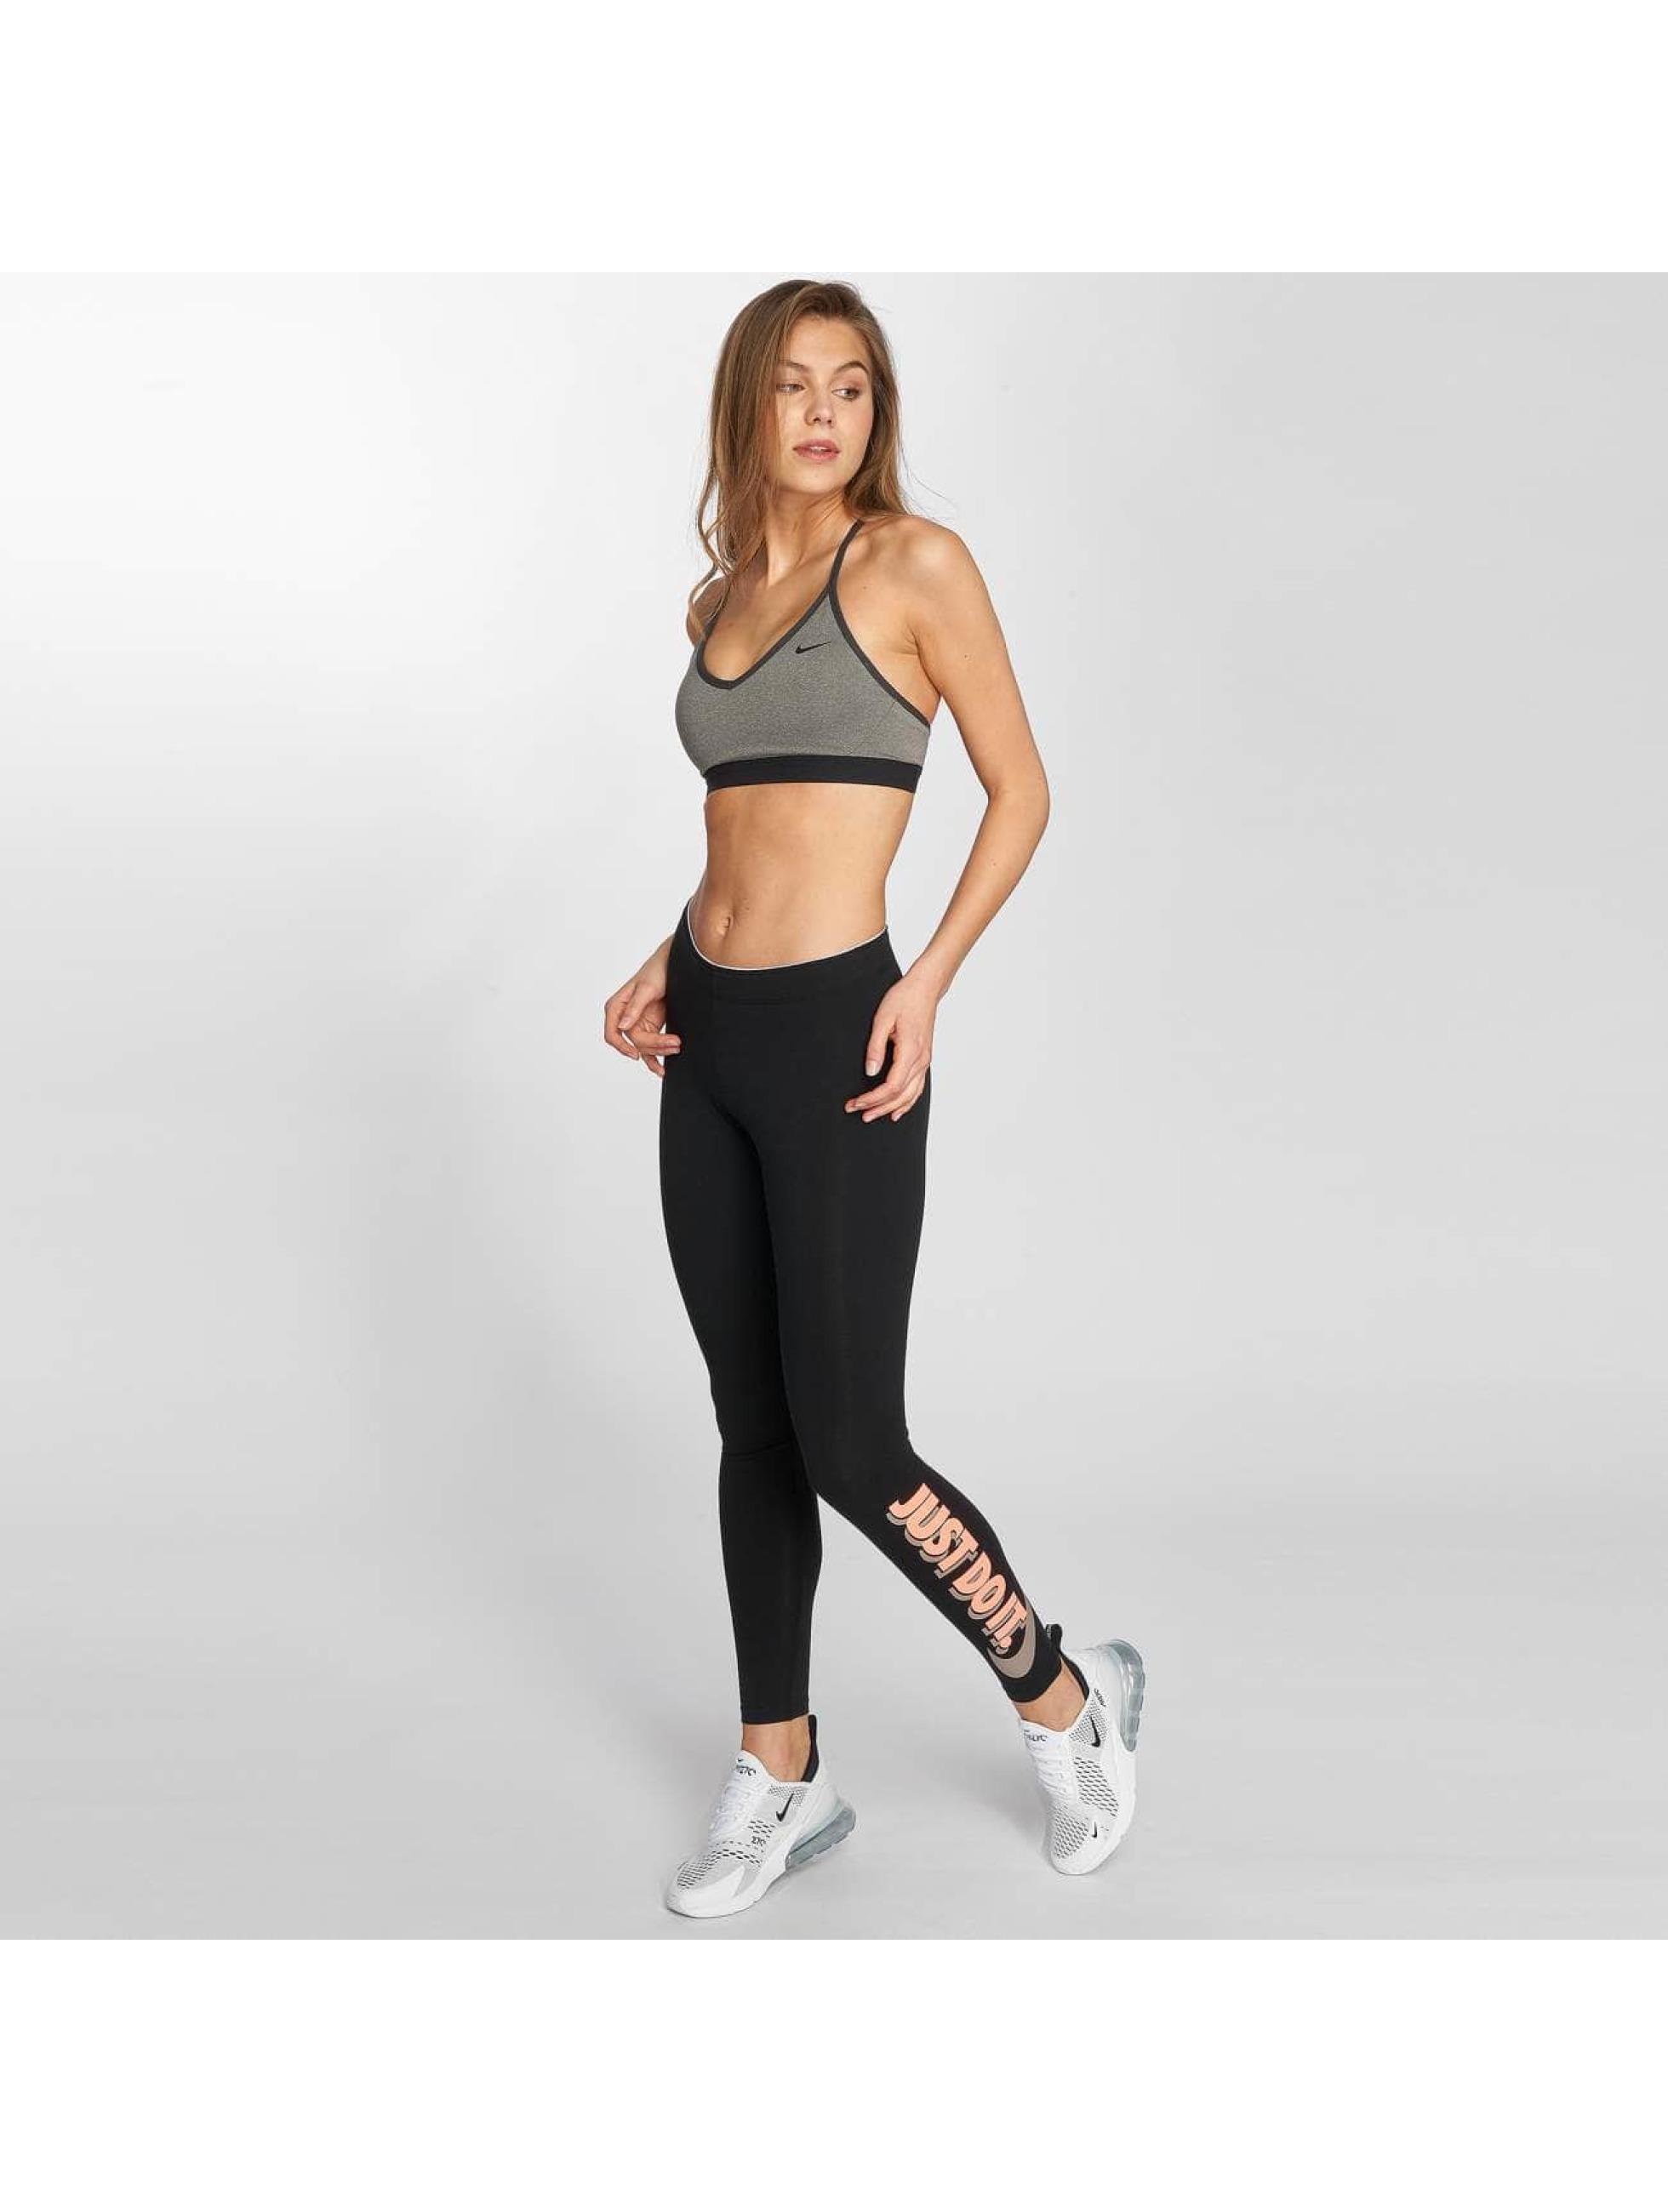 Nike Performance Sport BH Indy grau